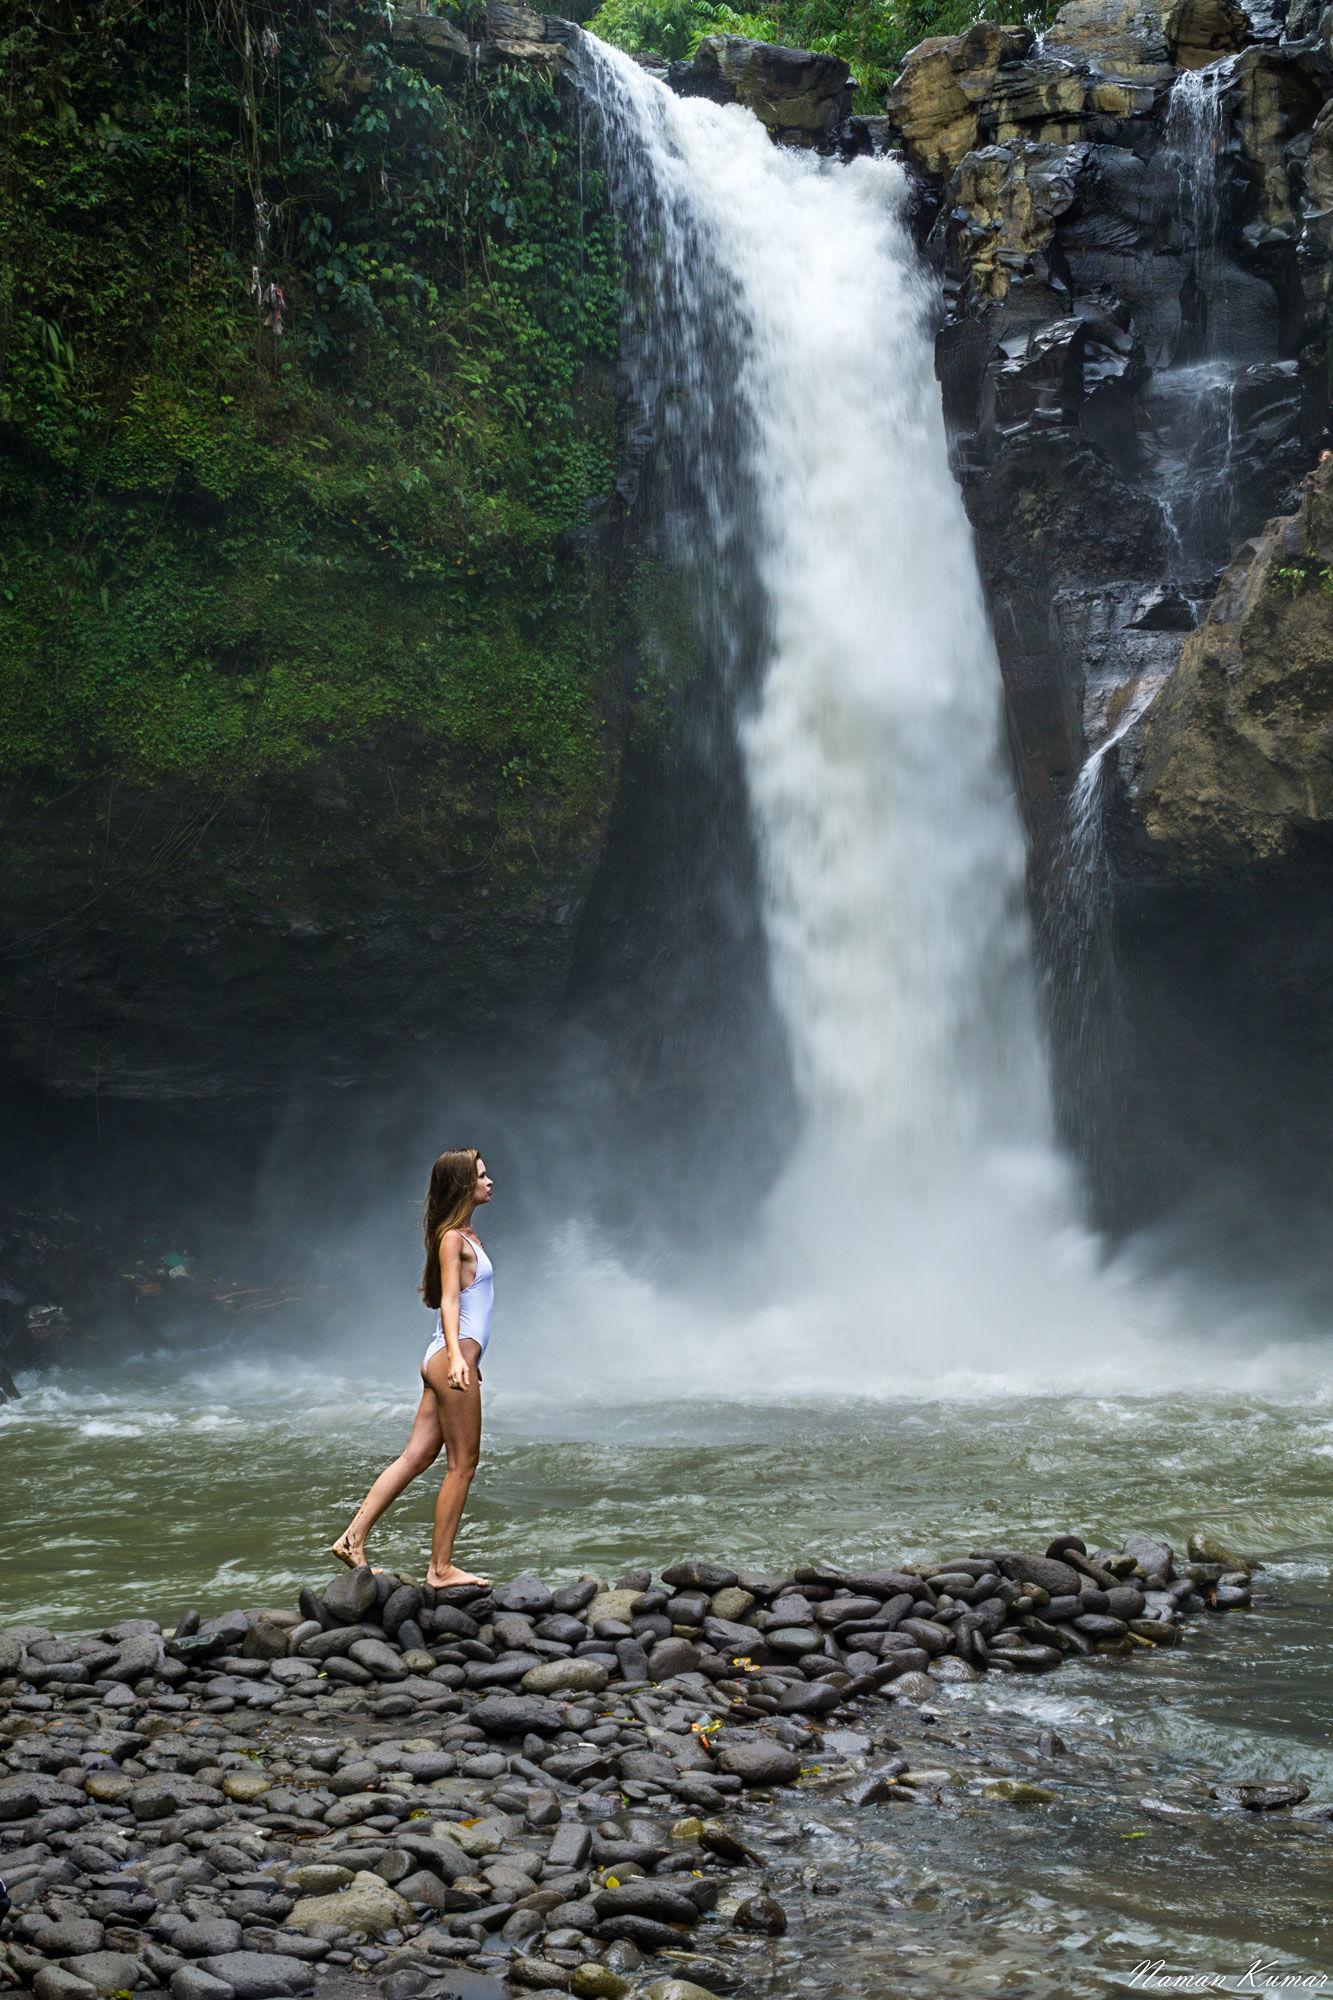 Photo of Tegenungan Waterfall By Naman Kumar